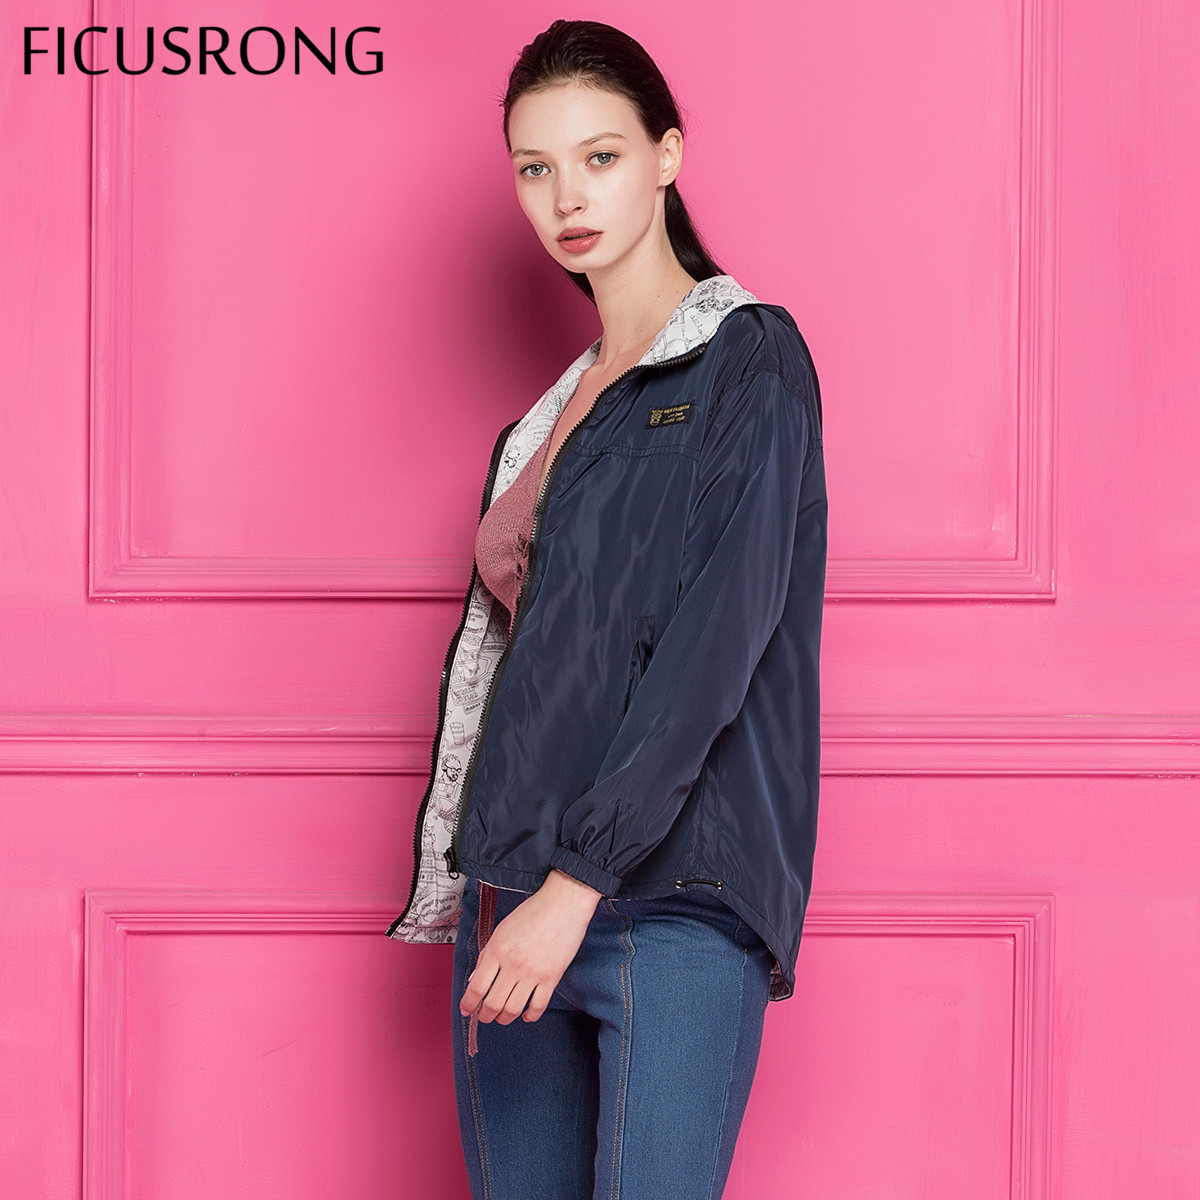 FICUSRONG 2018 New Autumn Women Bomber Basic Jacket Pocket Zipper Hooded Two Side Wear Cartoon Print Outwear Navy Loose Coat